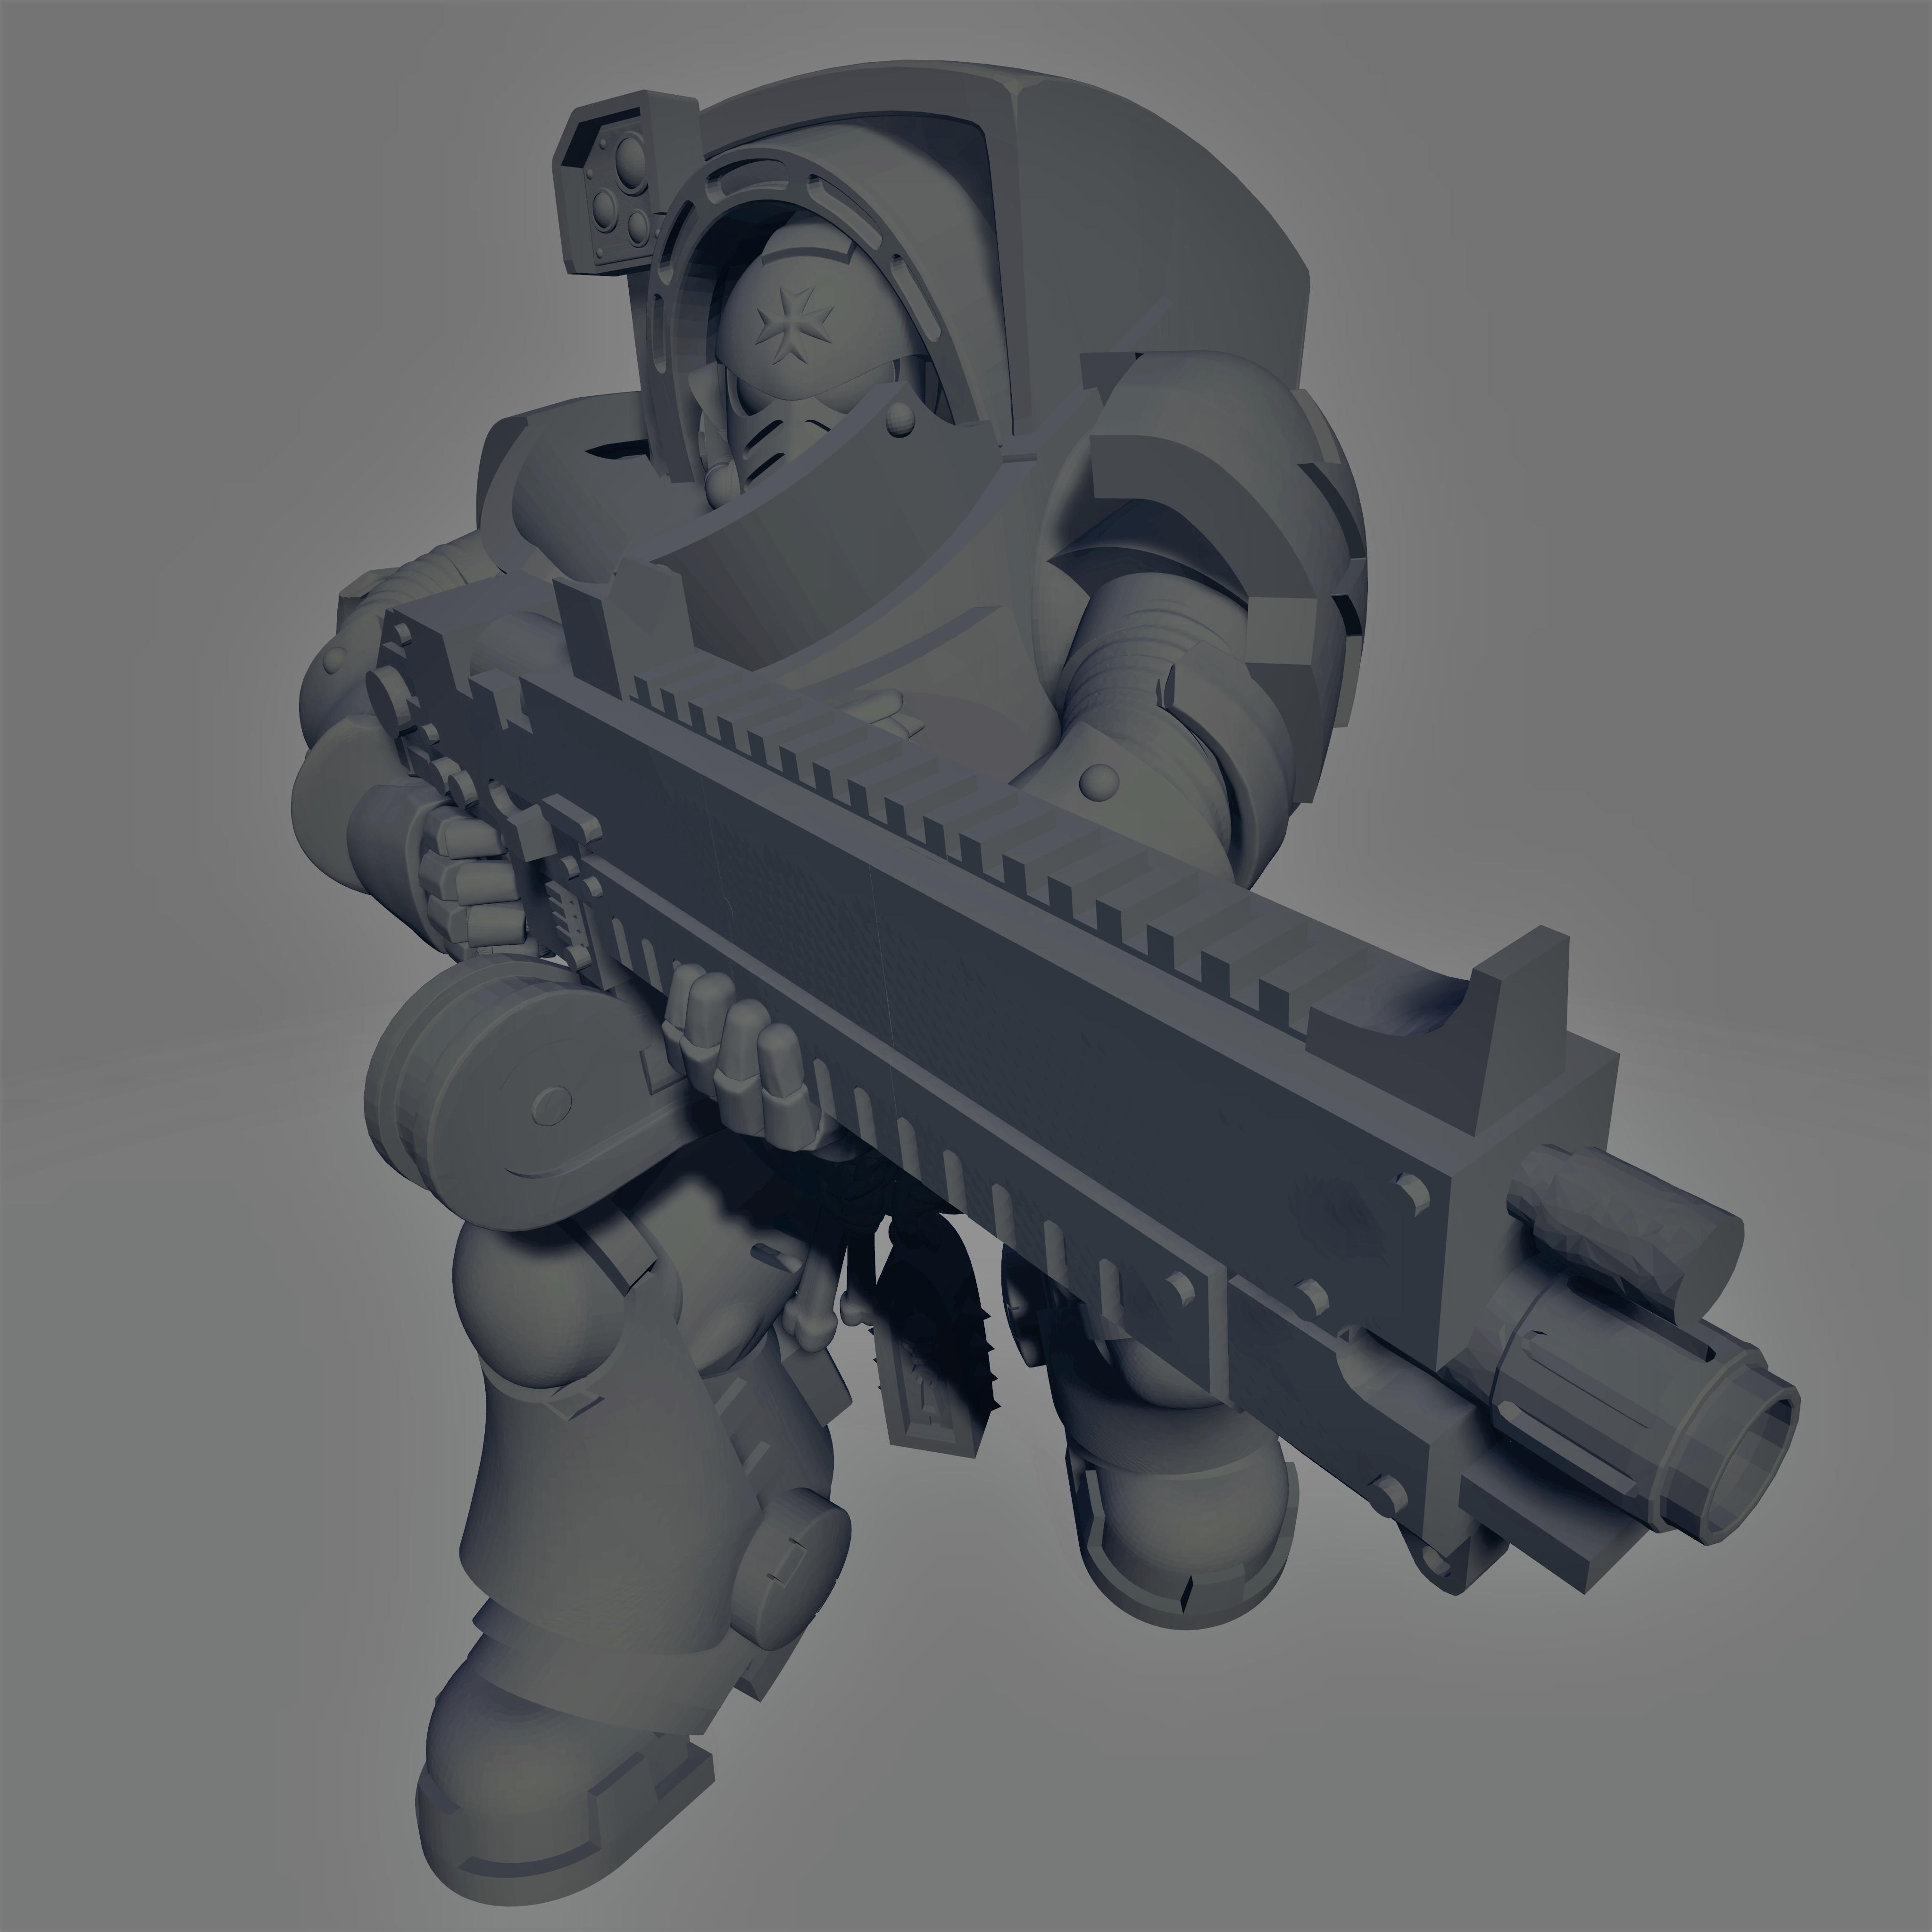 Dark Crusader - Heavy Infantry - Hellstorm Bolt Rifle - 02.jpg Download free STL file Dark Crusader Heavy Infantry Squad • 3D printer model, GrimmTheMaker